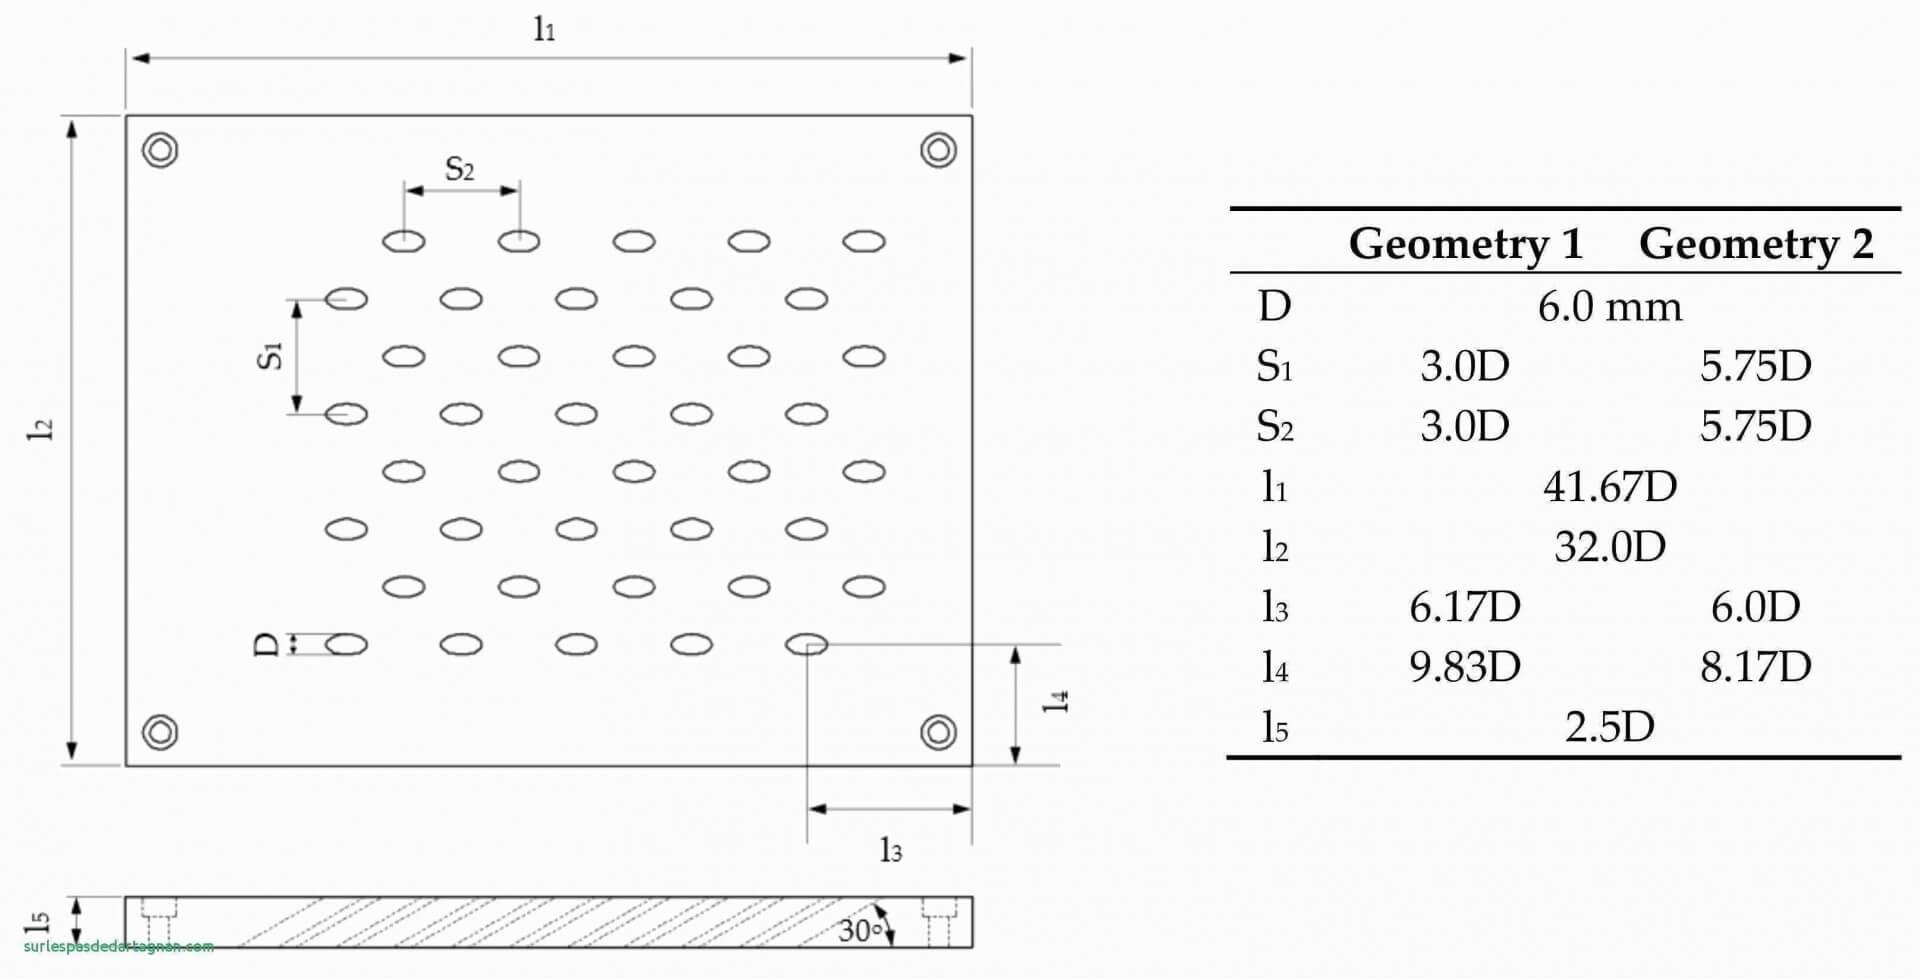 Phenomenal Free Printable Checks Template Ideas Blank within Customizable Blank Check Template